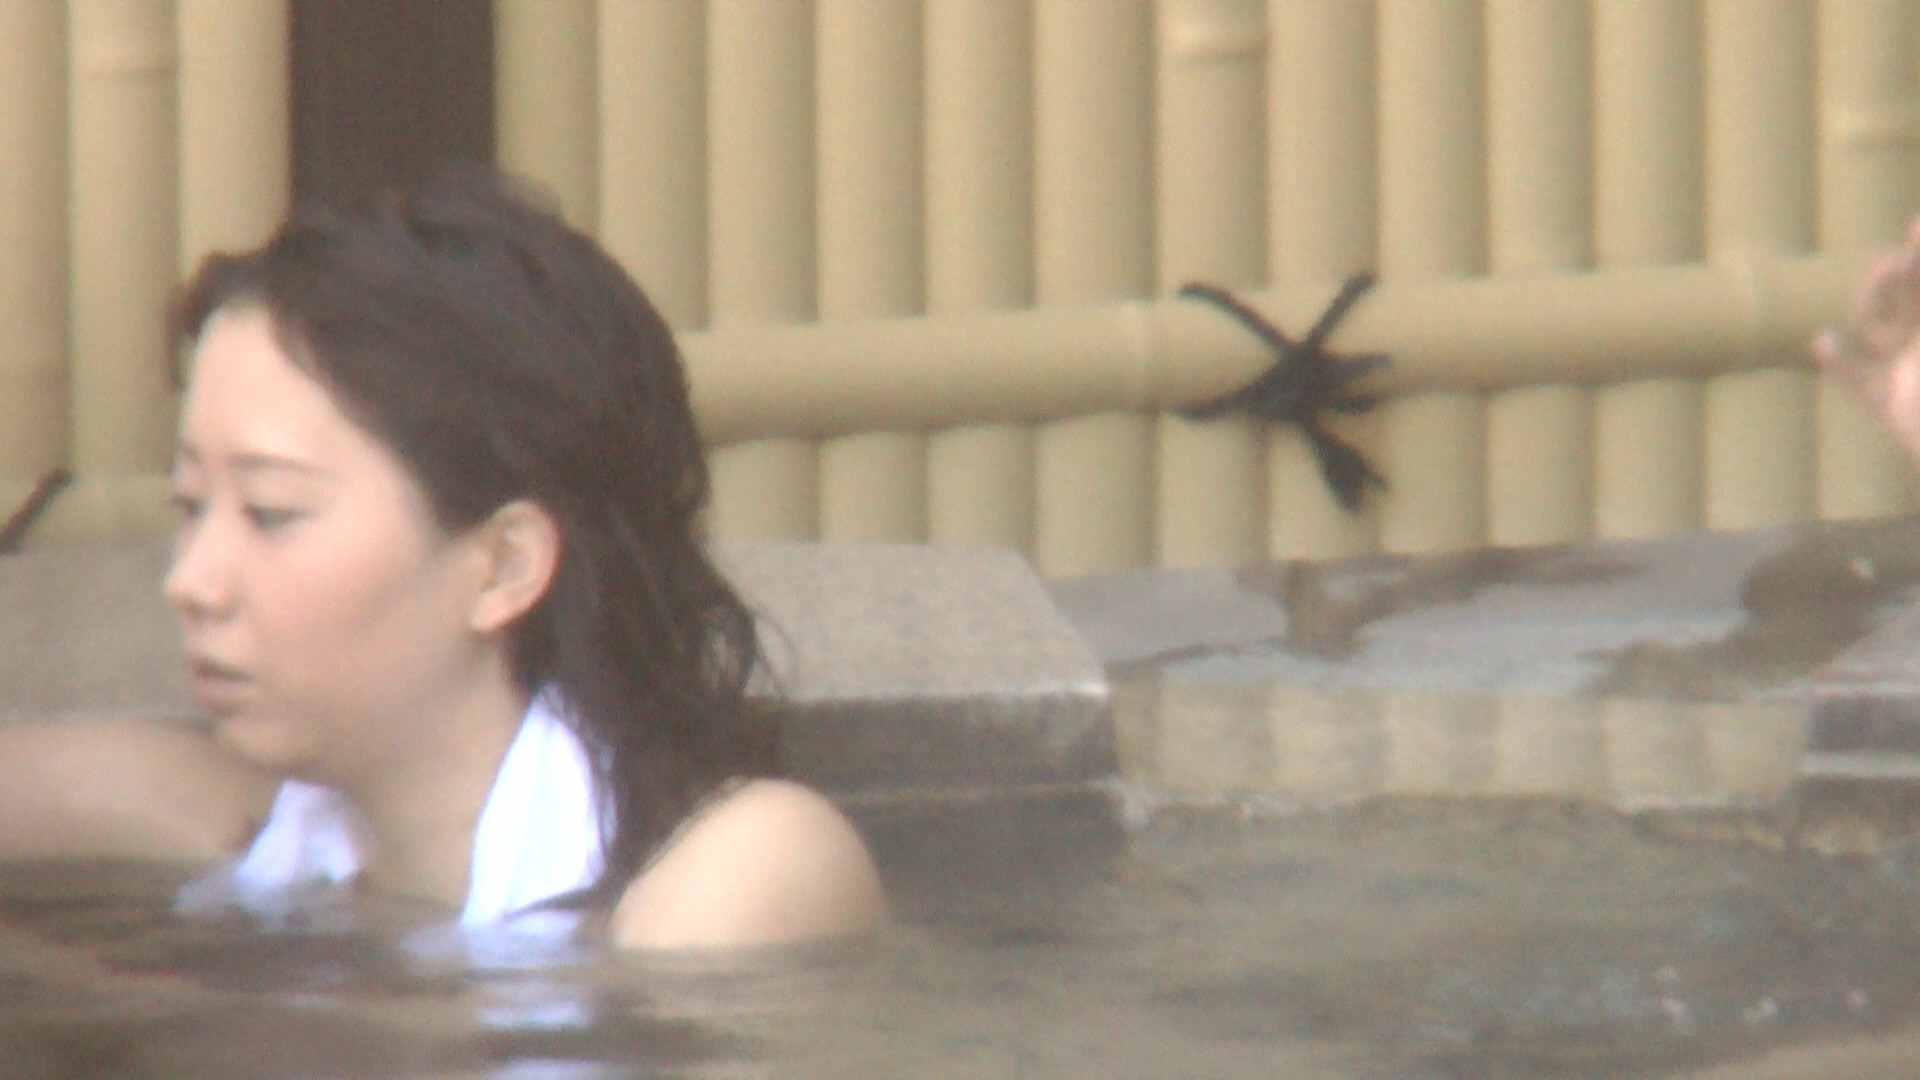 Aquaな露天風呂Vol.211 盗撮シリーズ   露天風呂編  76PIX 27